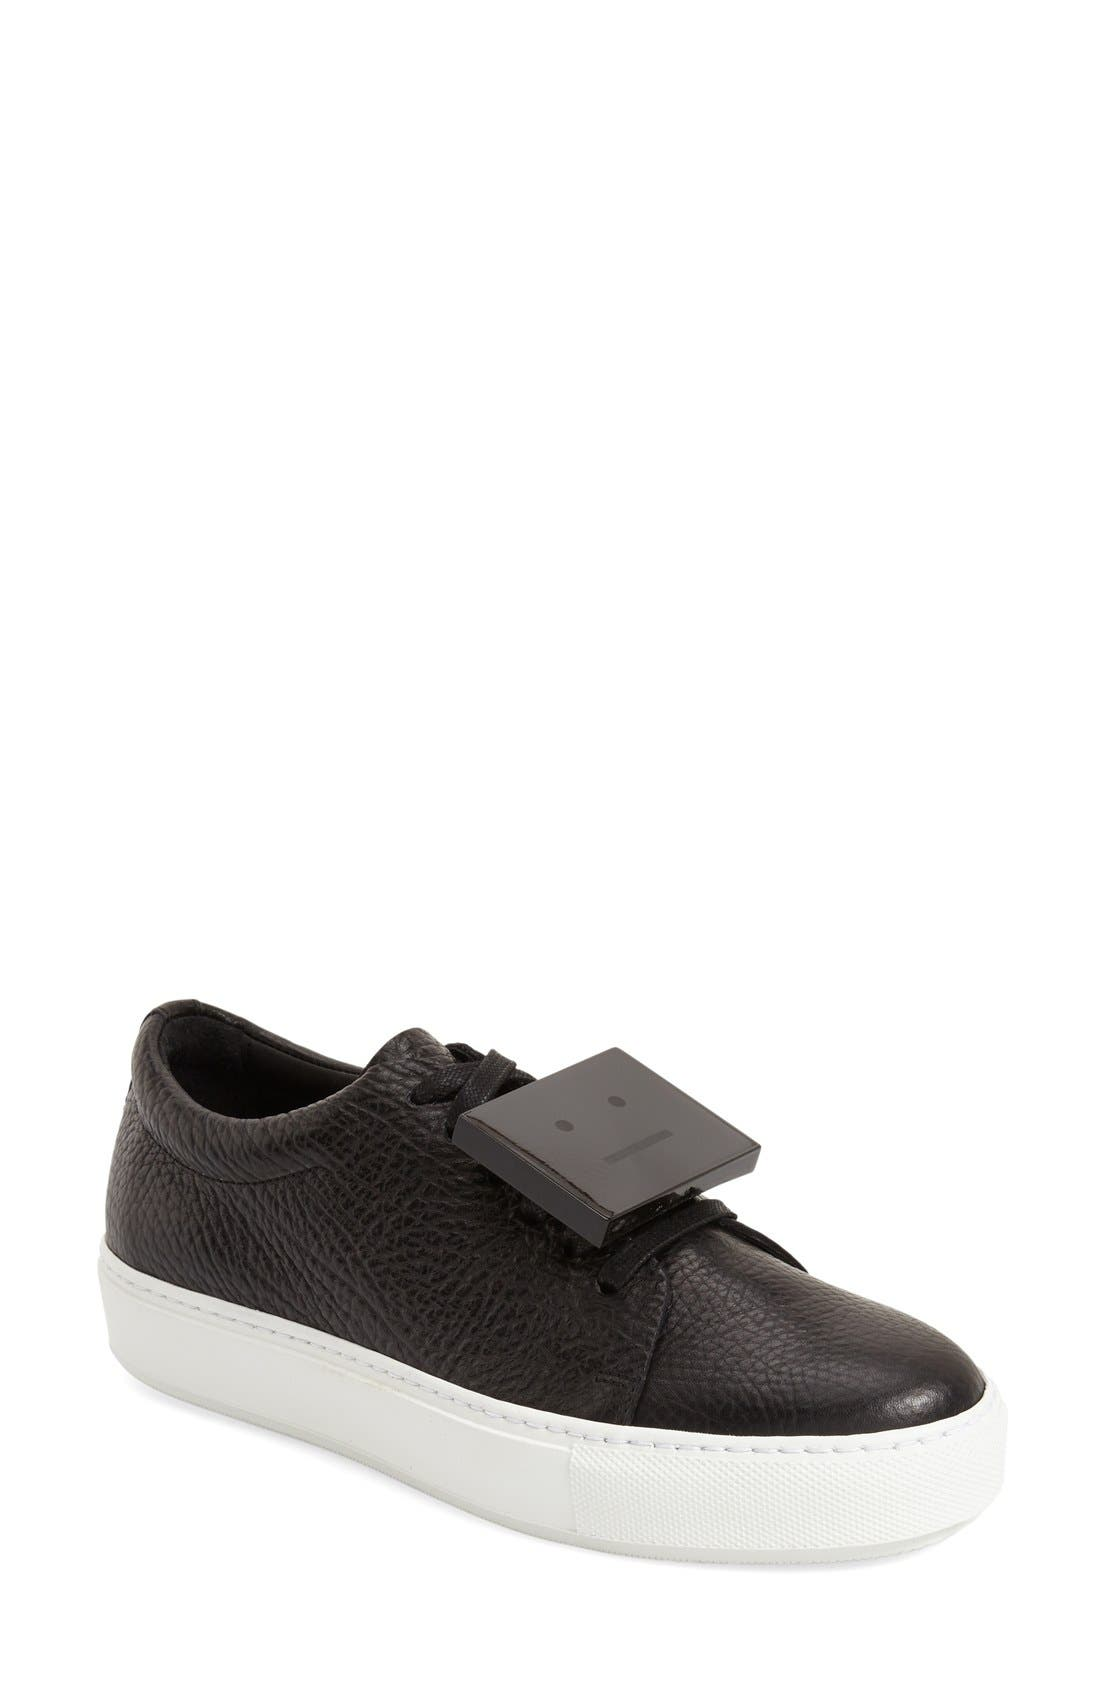 Adriana - Grain Leather Sneaker,                         Main,                         color, 001